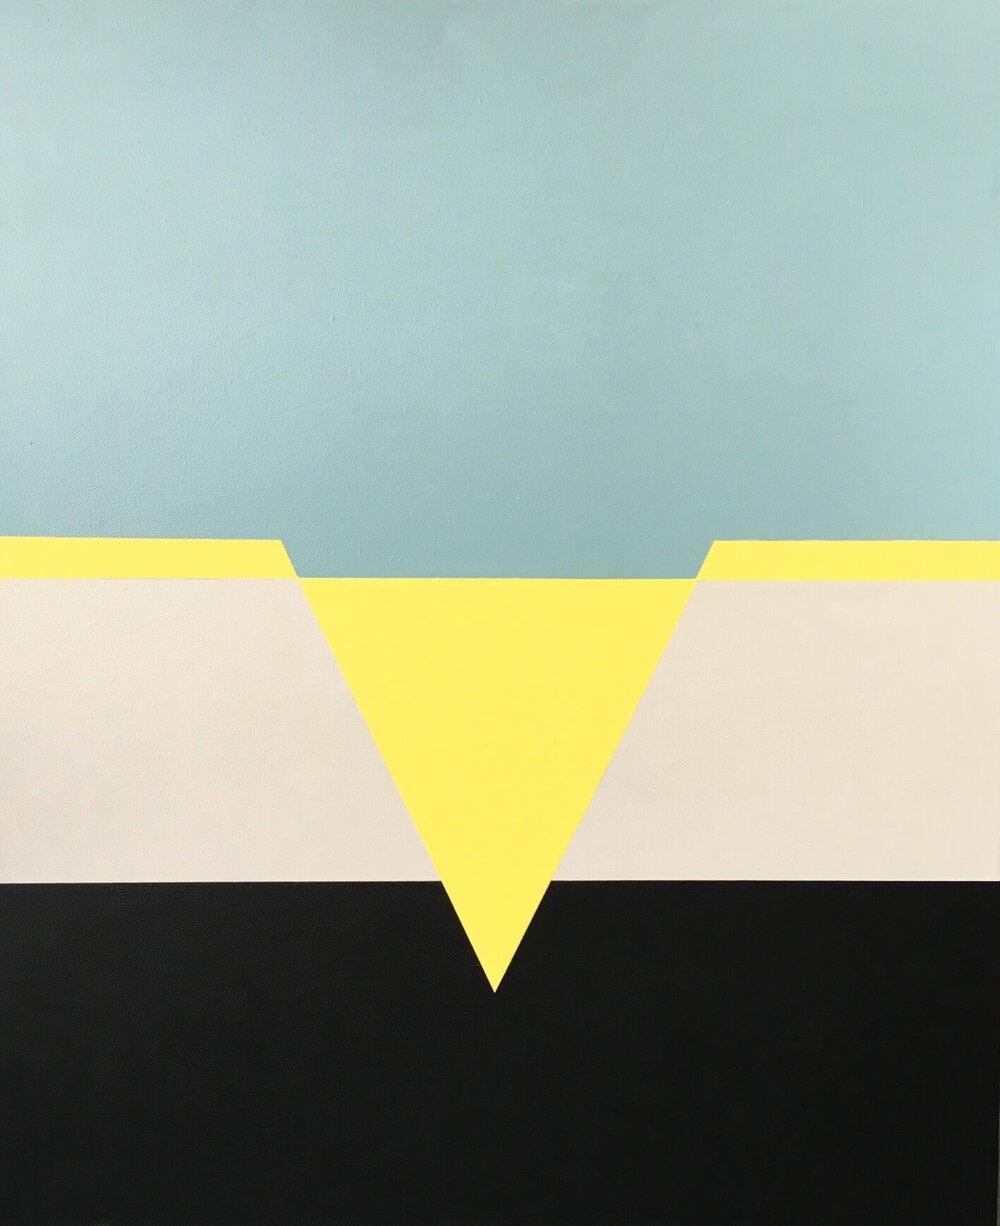 Minimal 13, 60 cm x 50 x 4 cm, Acryl auf Leinwand, © Ute Latzke, 2016, 500,- Euro.